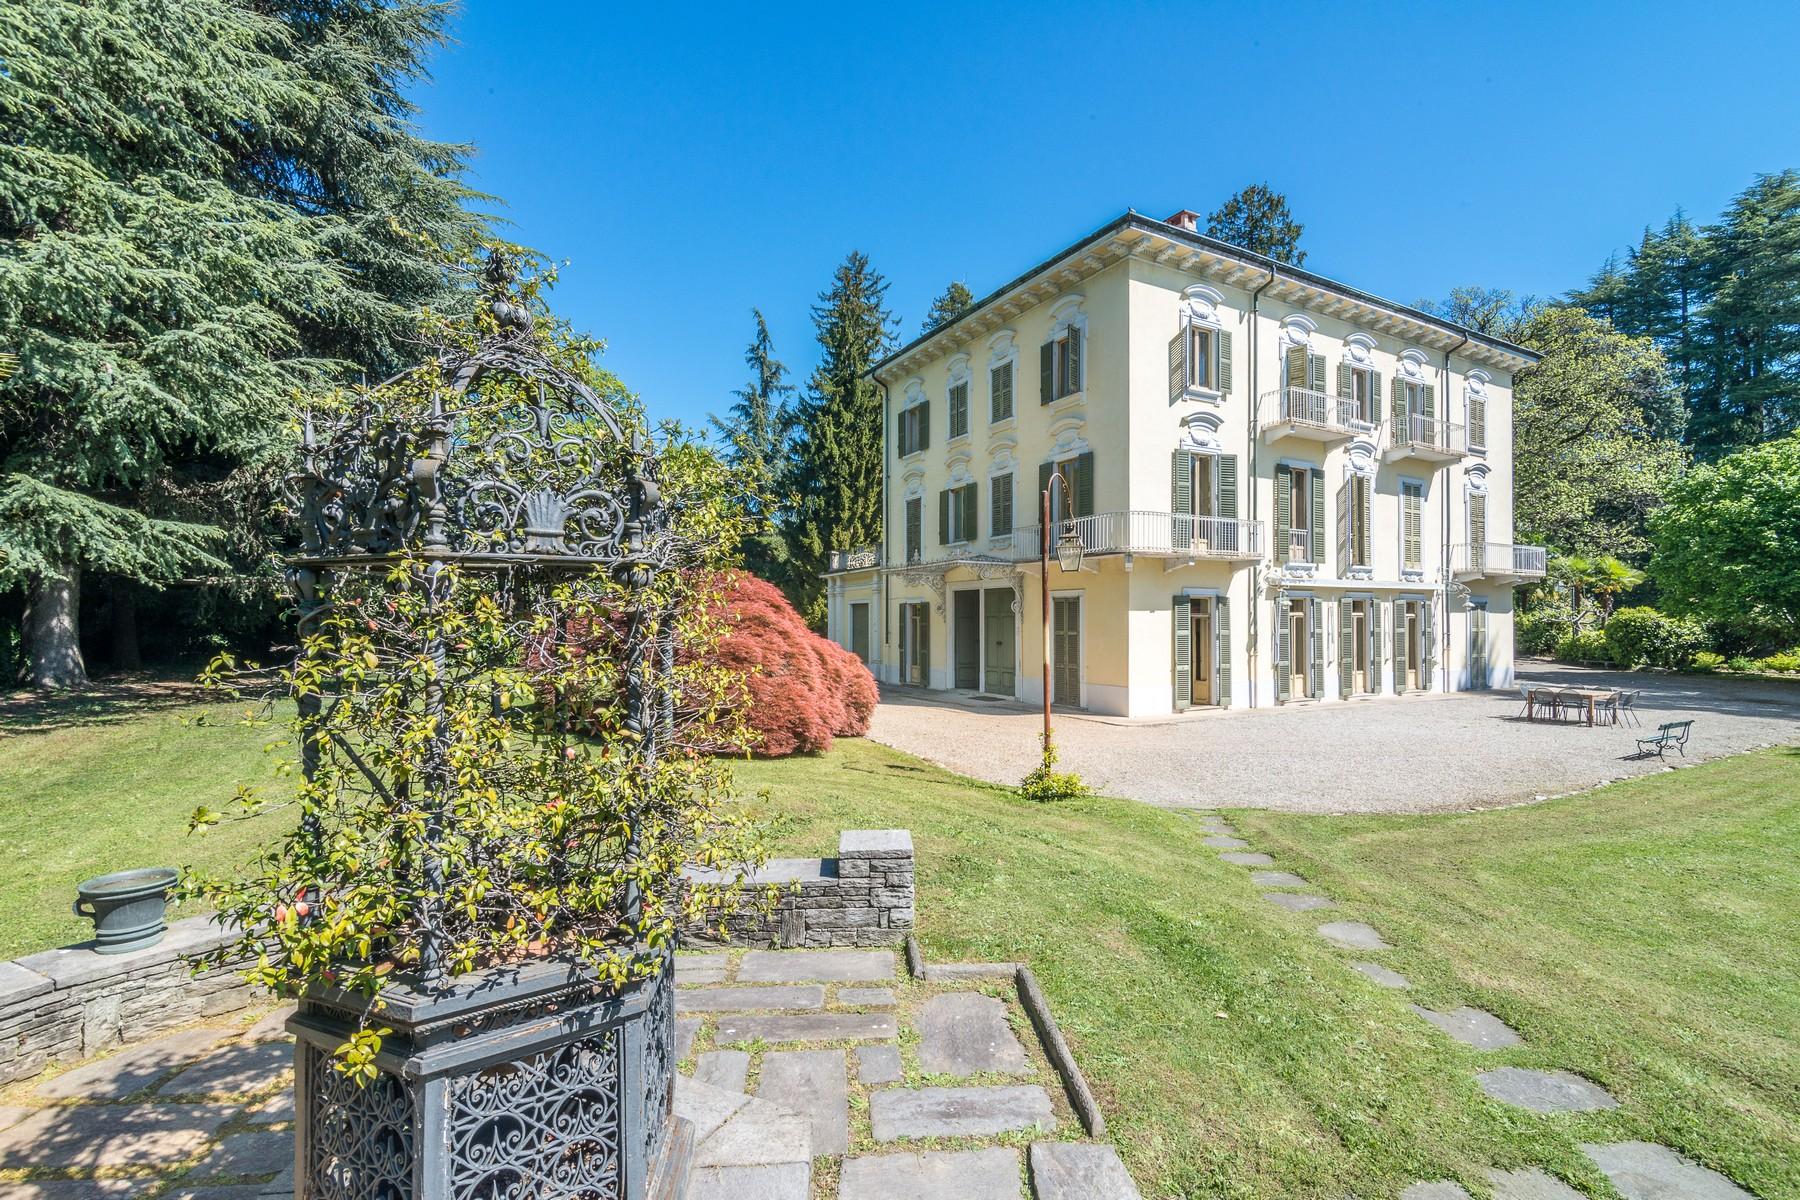 Villa in Vendita a Varese: 5 locali, 1500 mq - Foto 2